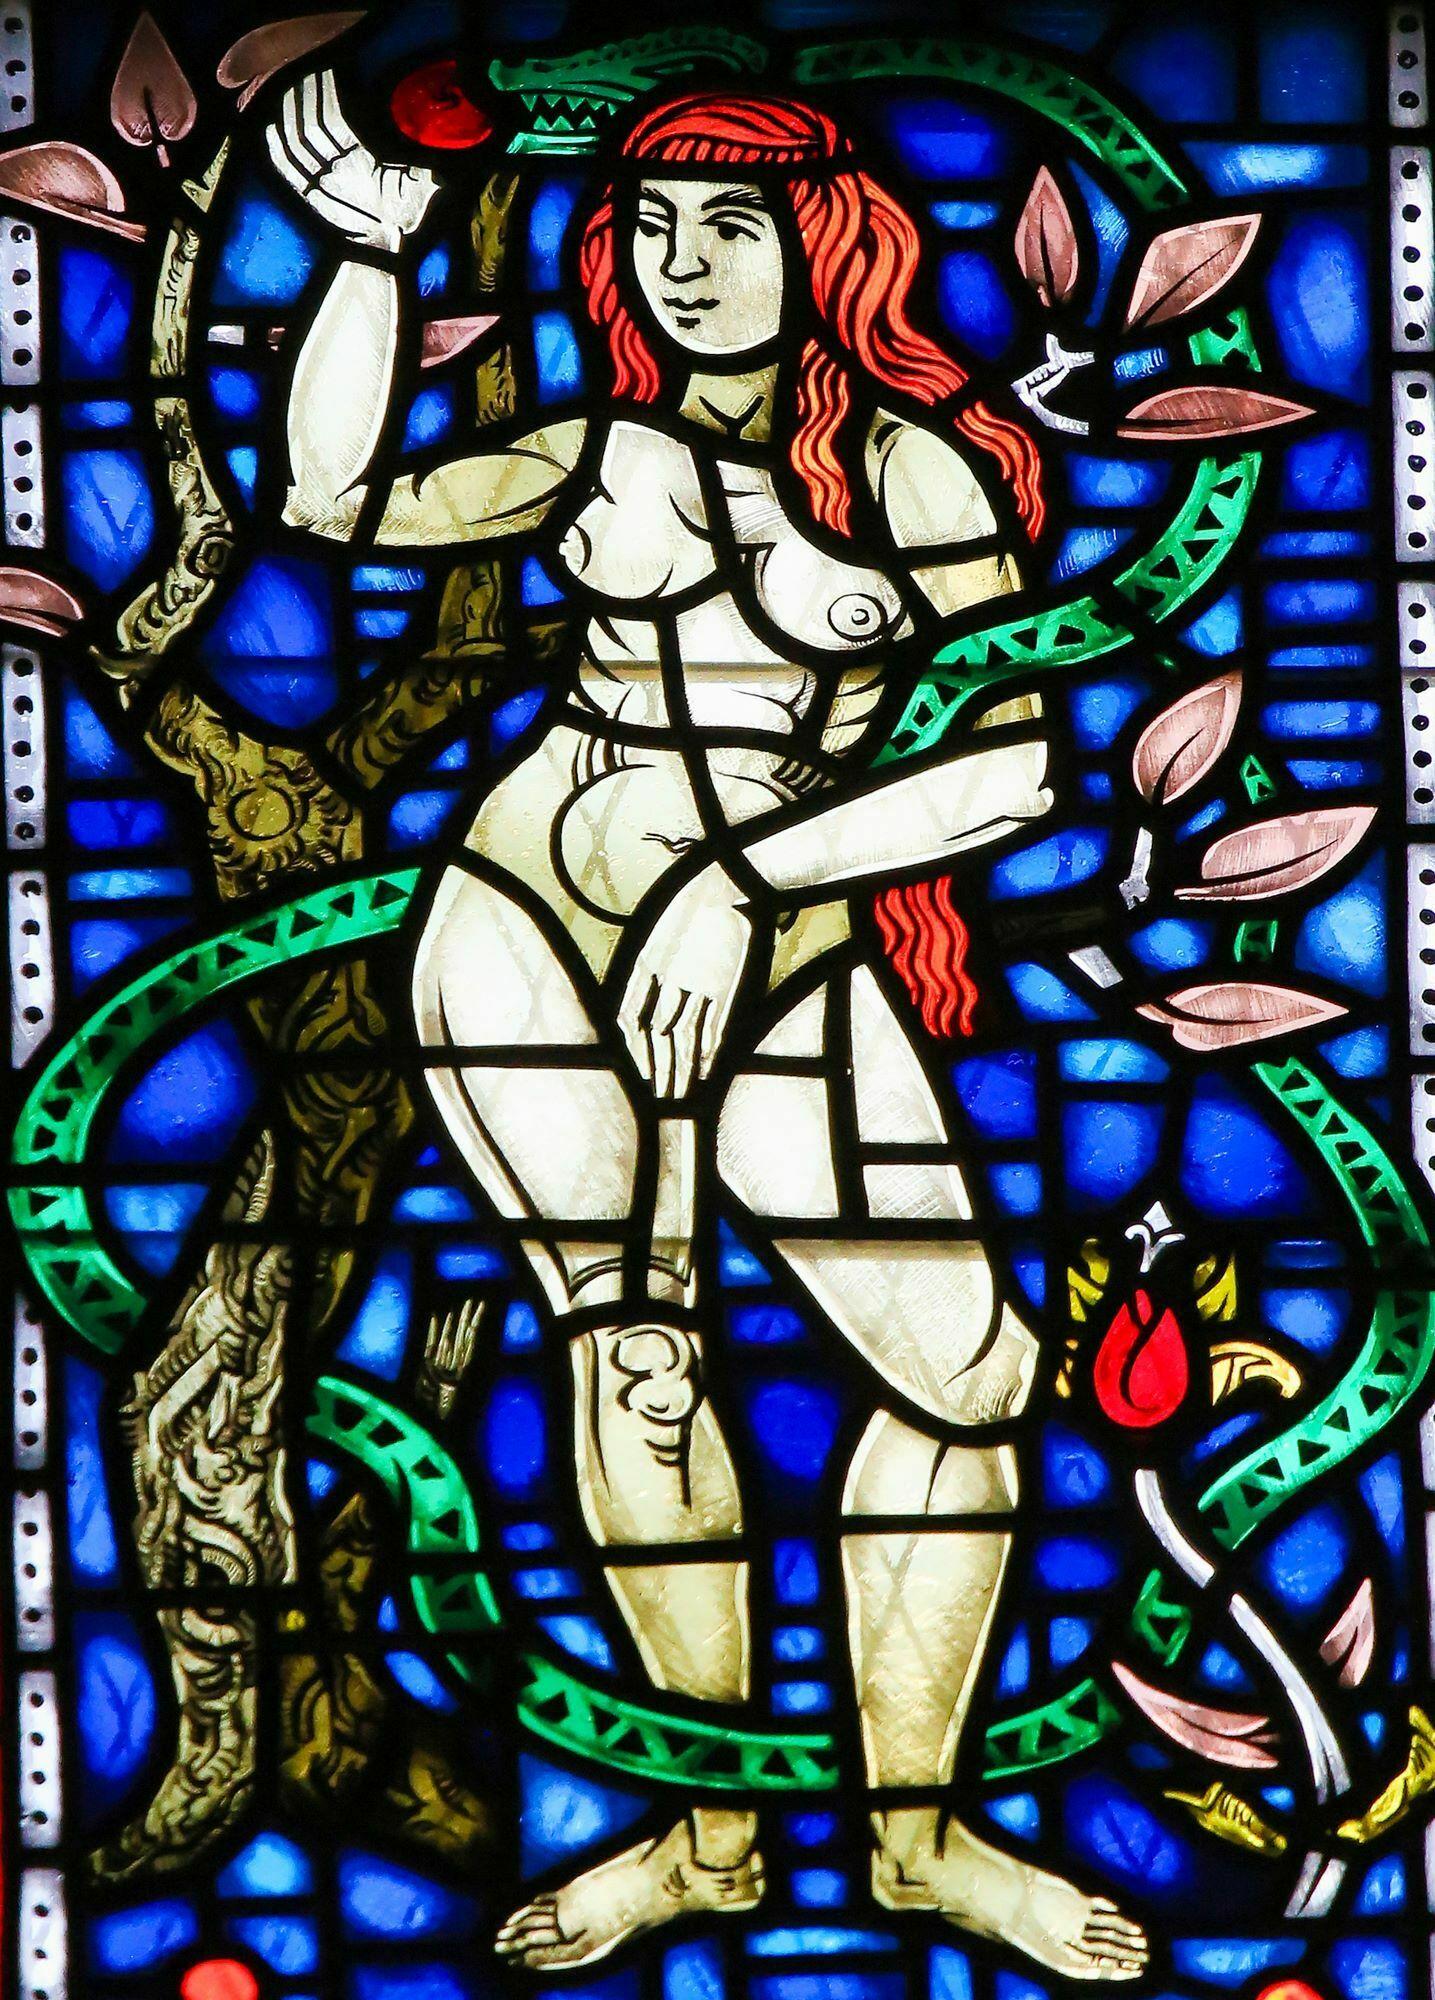 Eve and original sin